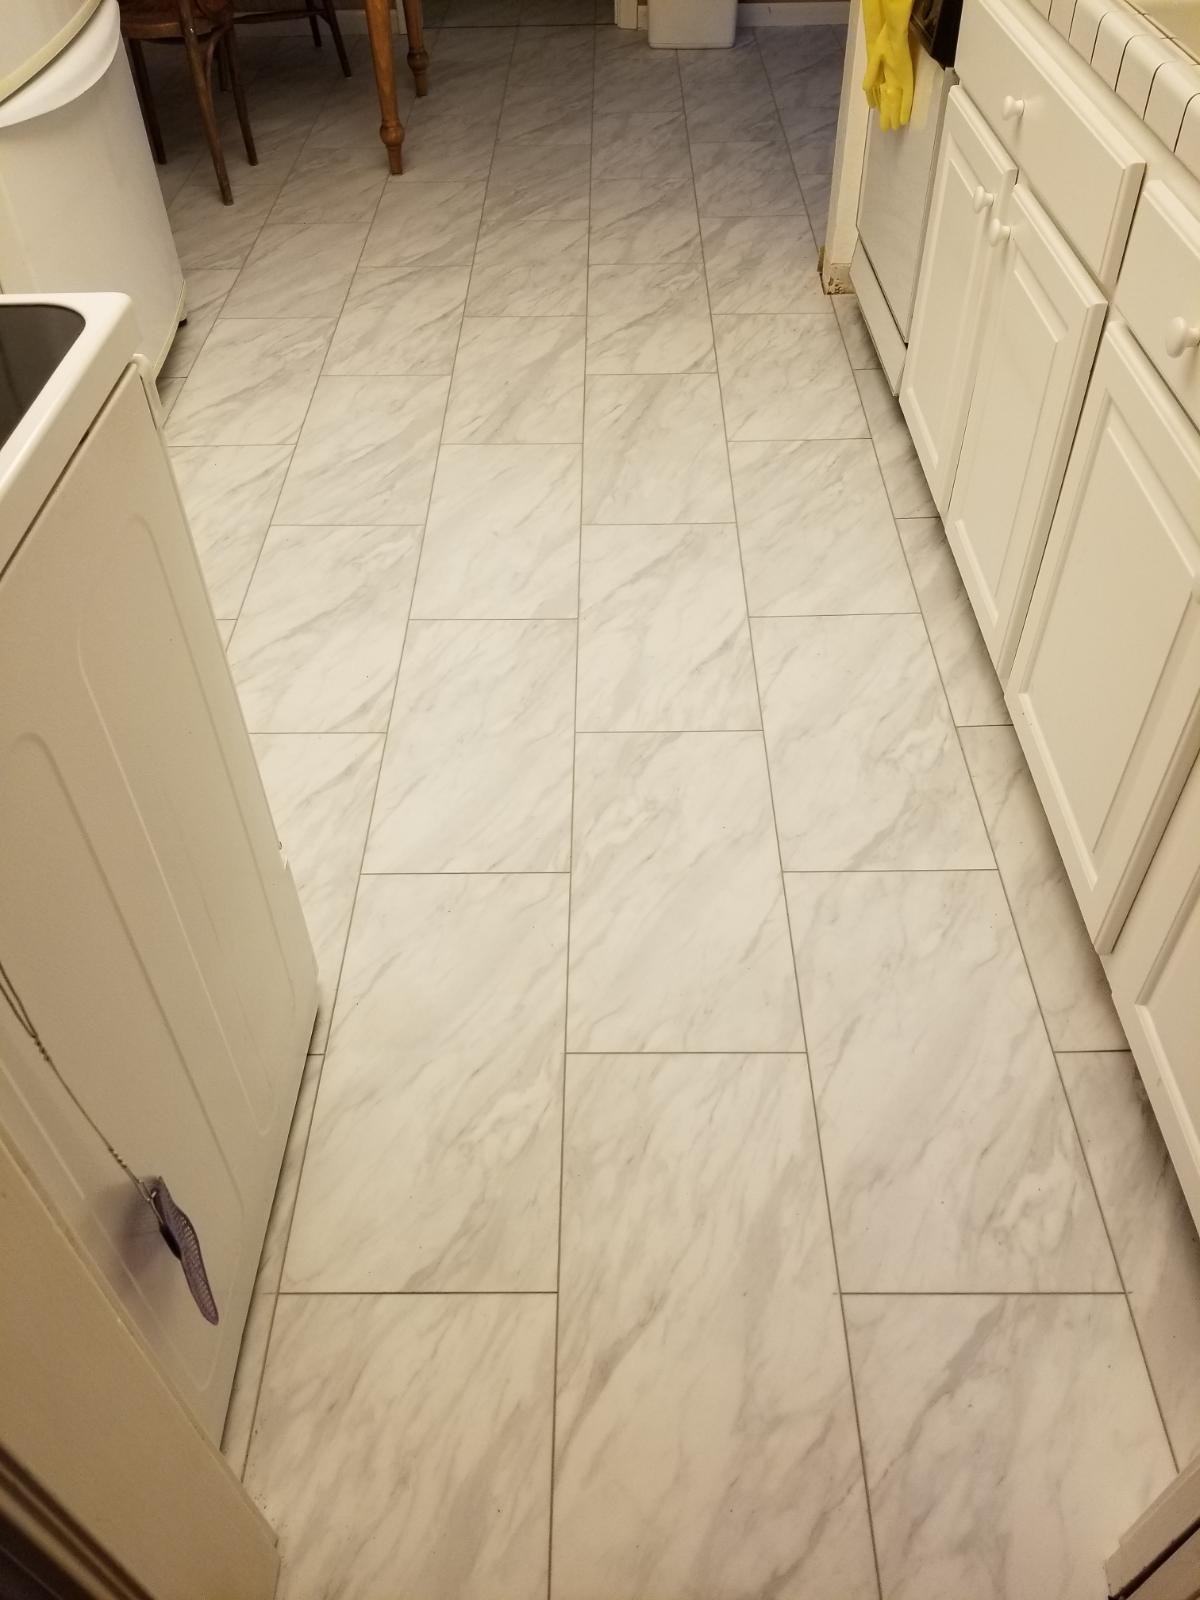 Cupertino - Install LVT (luxury vinyl tile) to kitchenette.